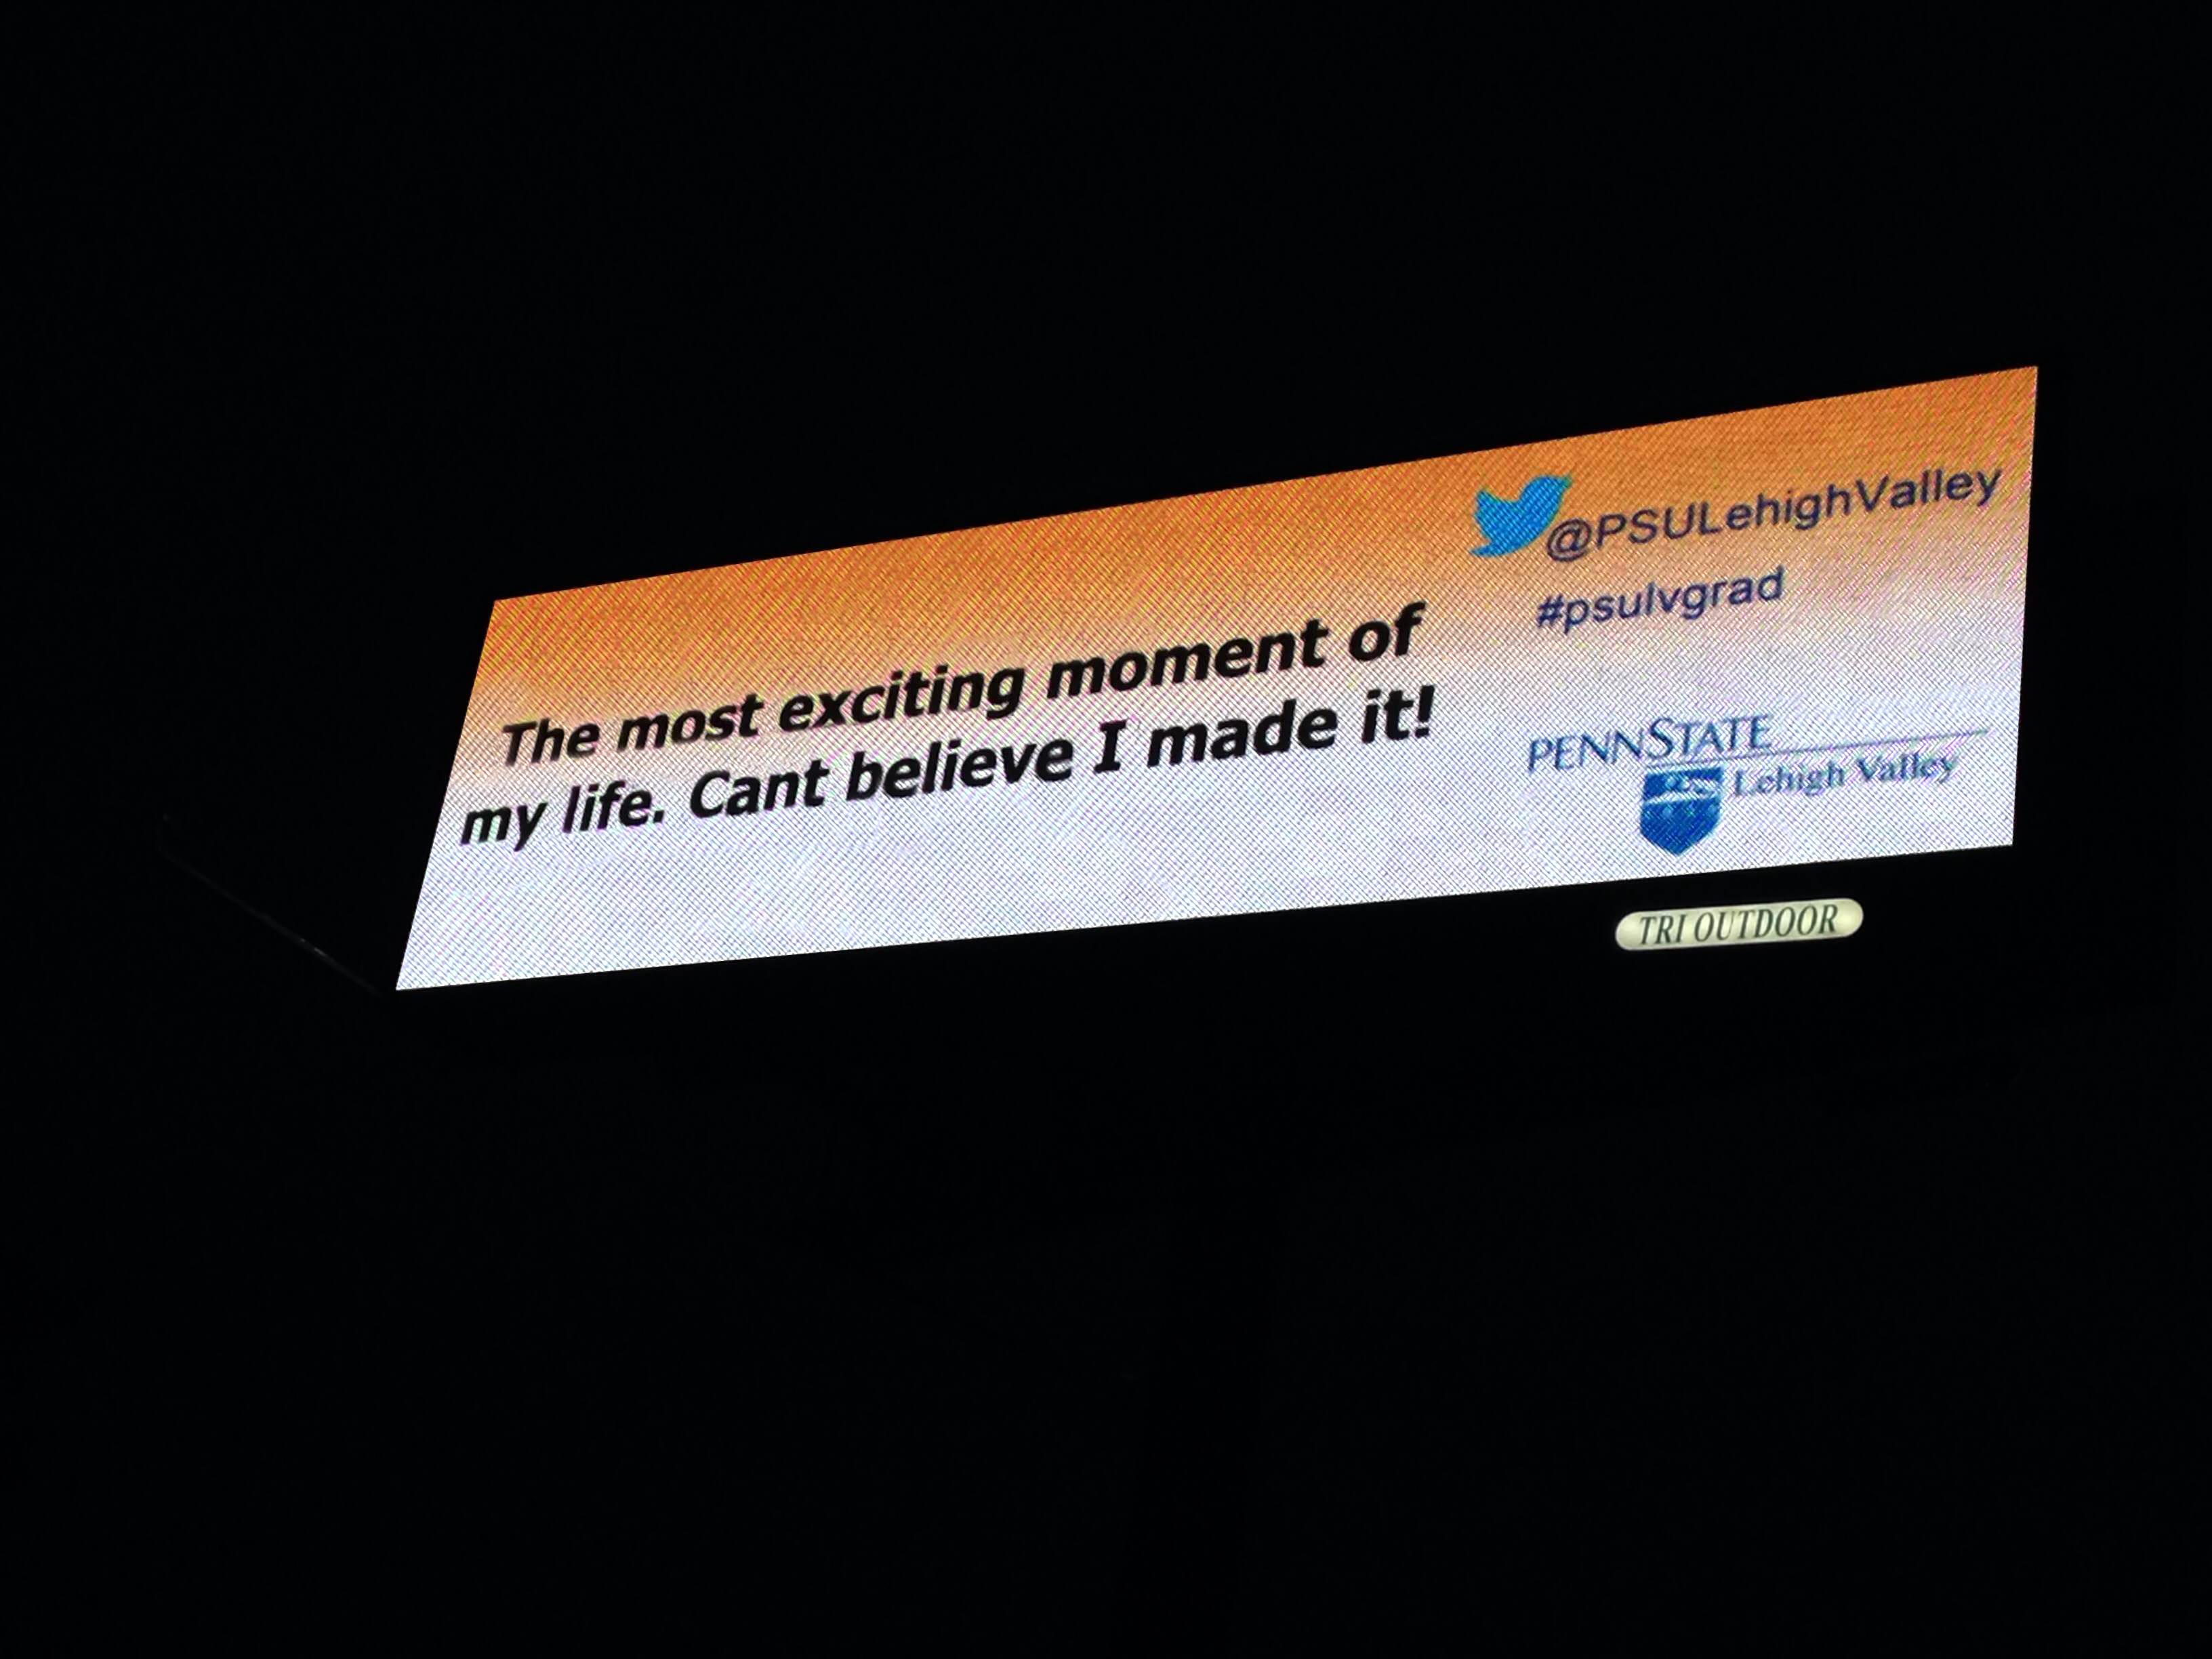 Penn State Live Tweets on Watchfire Digital Billboard